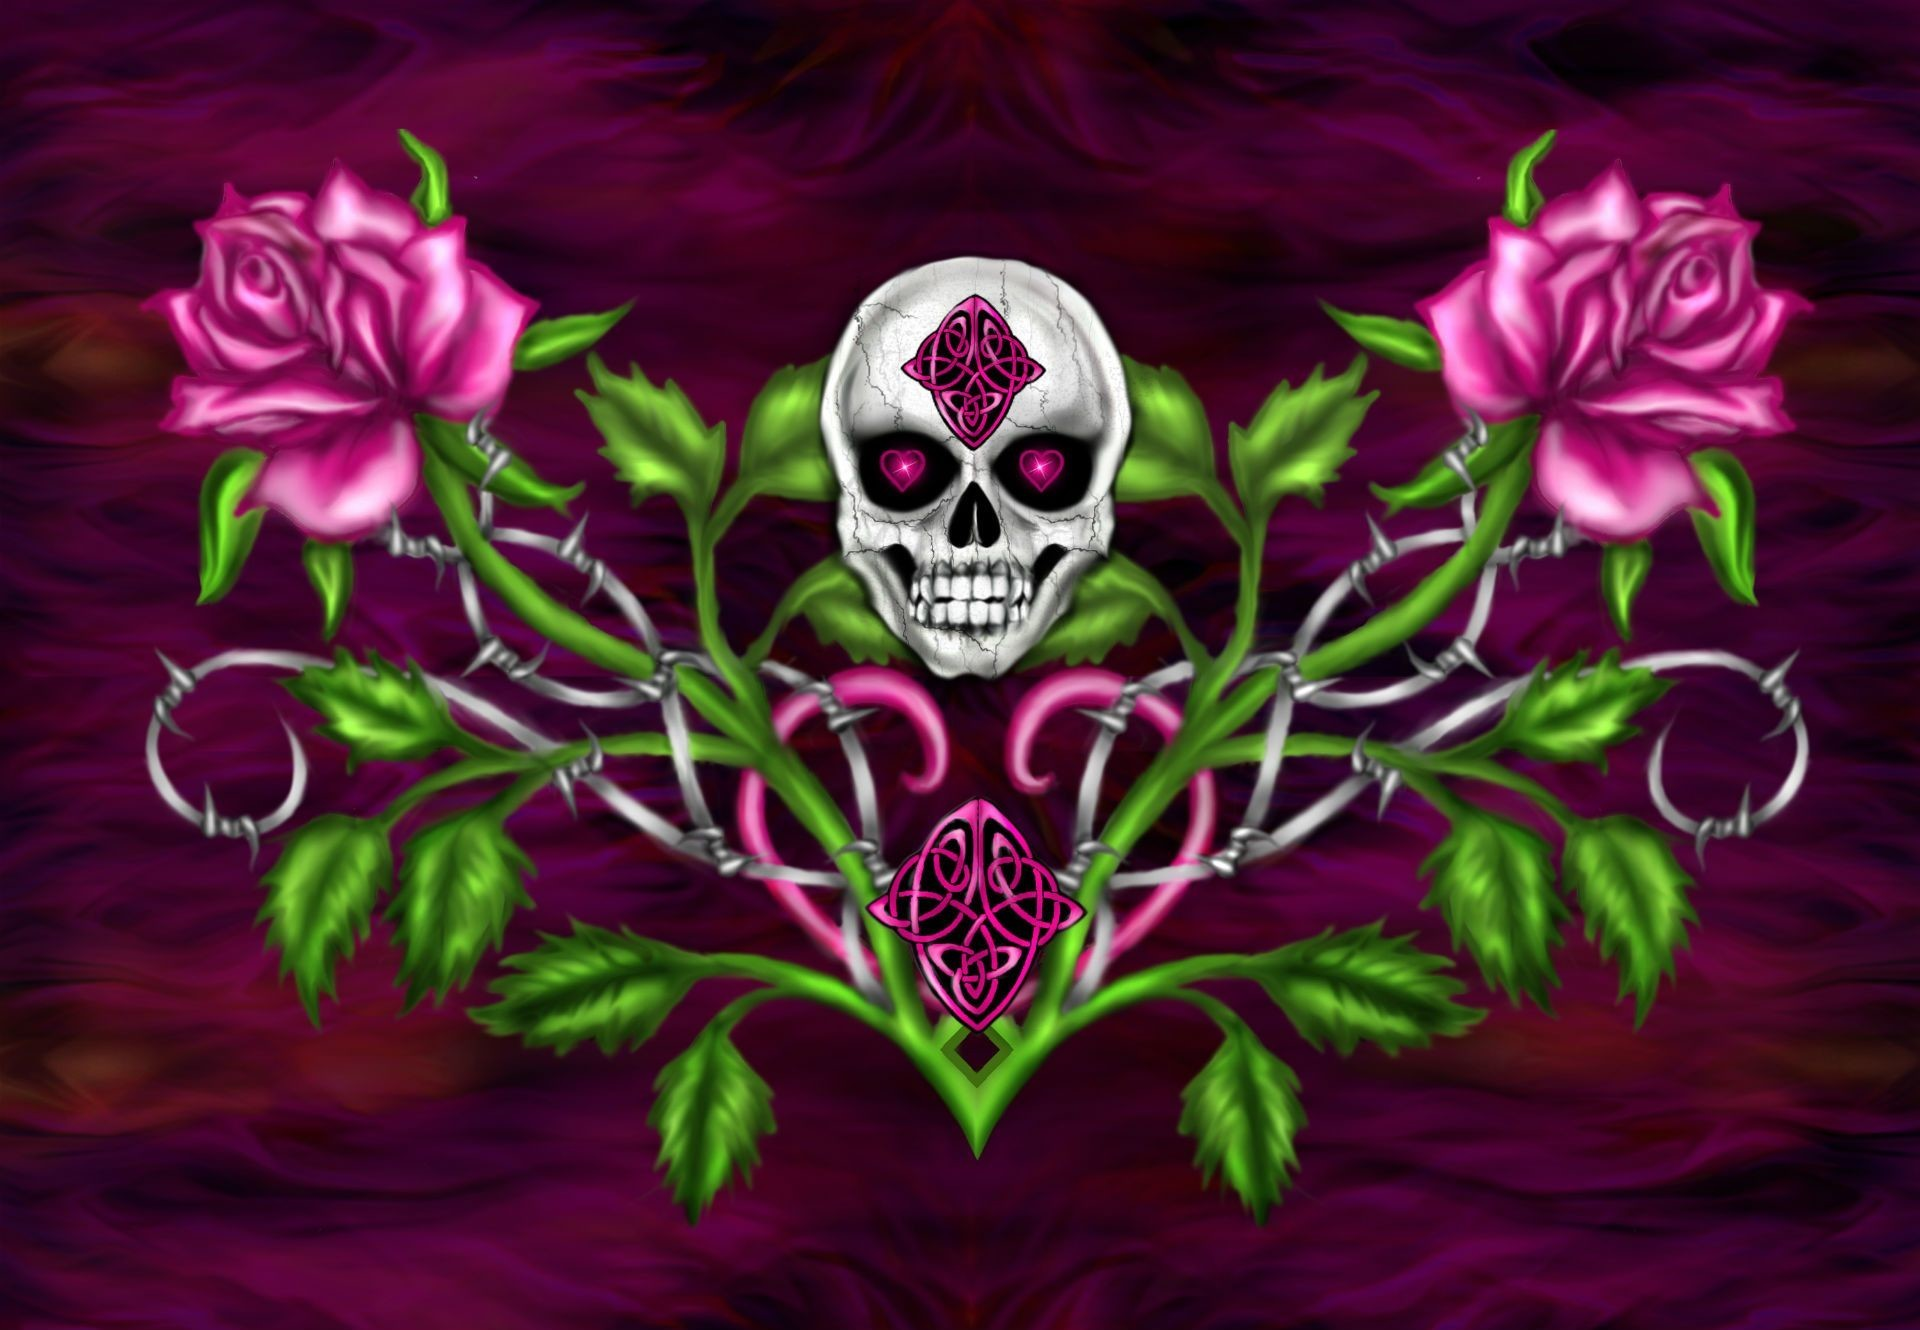 Res: 1920x1330, Skull wallpaper 201159 1920x1200